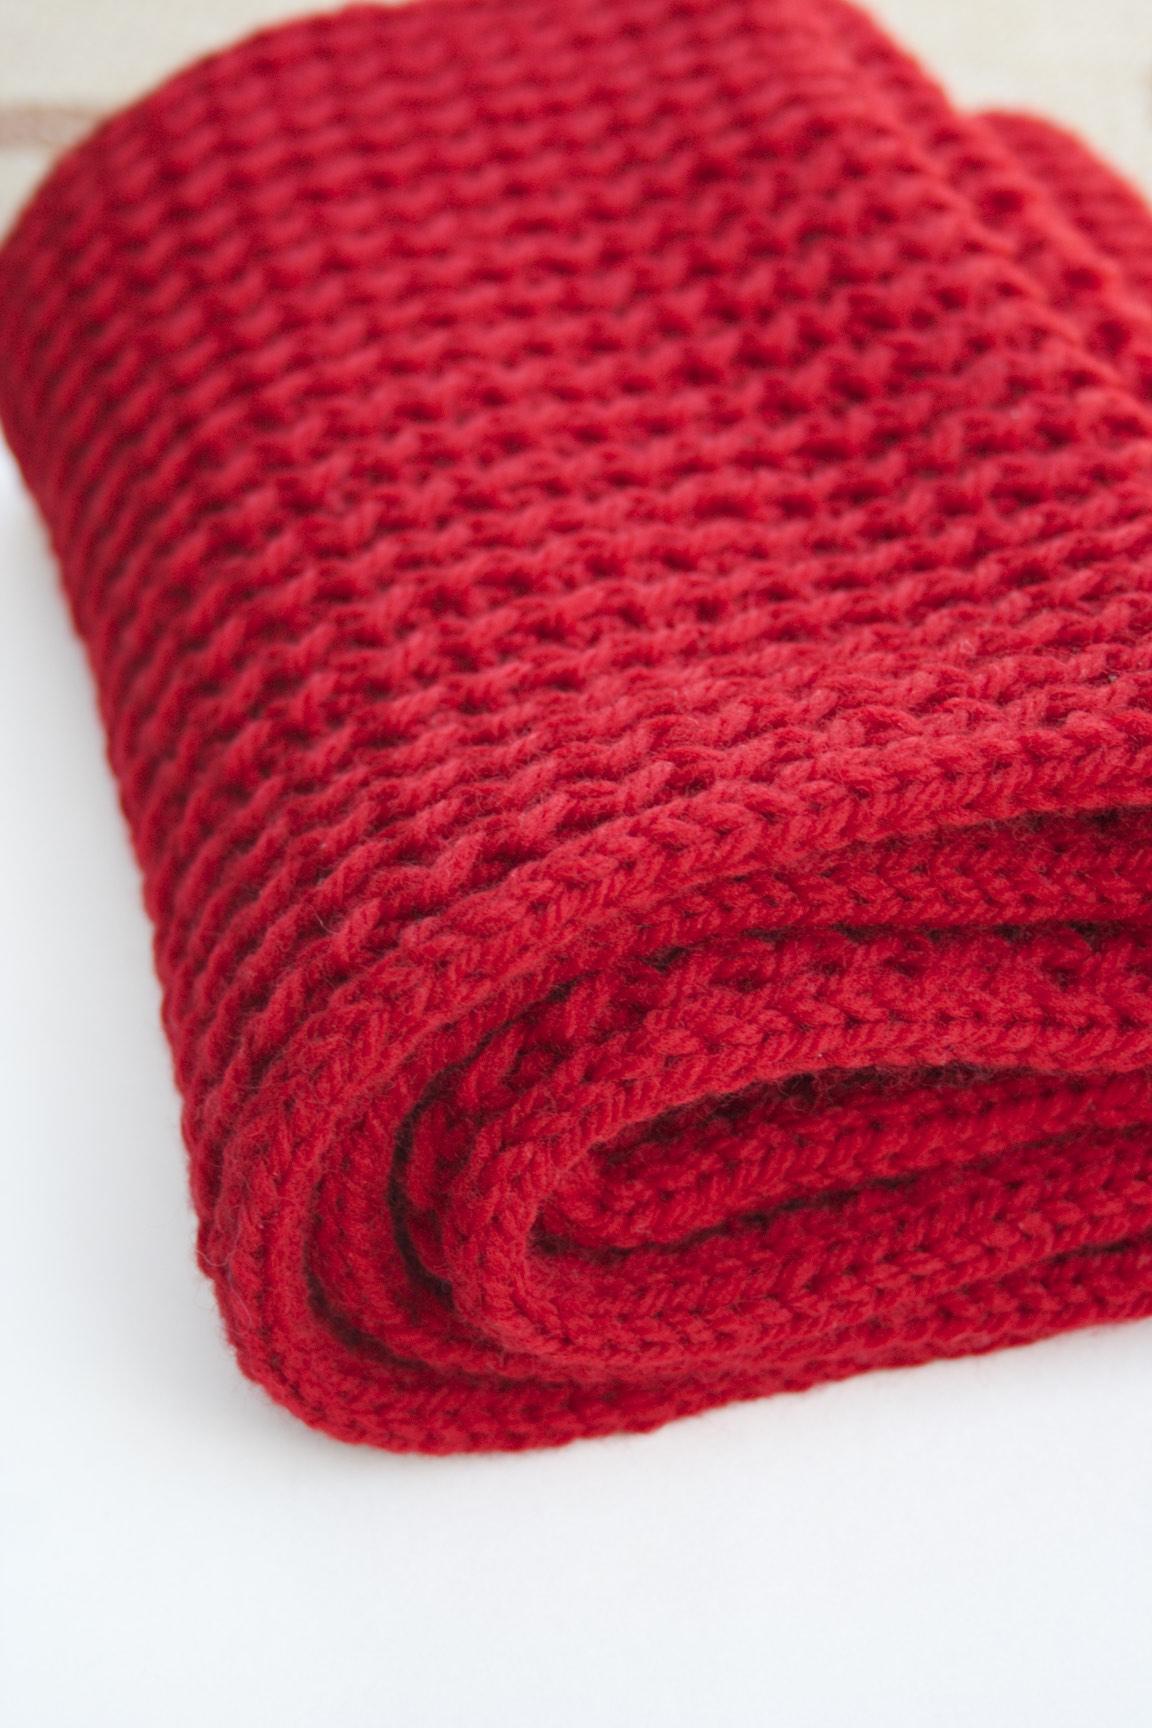 Oversized Cowl knitting pattern by Holli Yeoh   Vogue Knitting Early Fall 2015